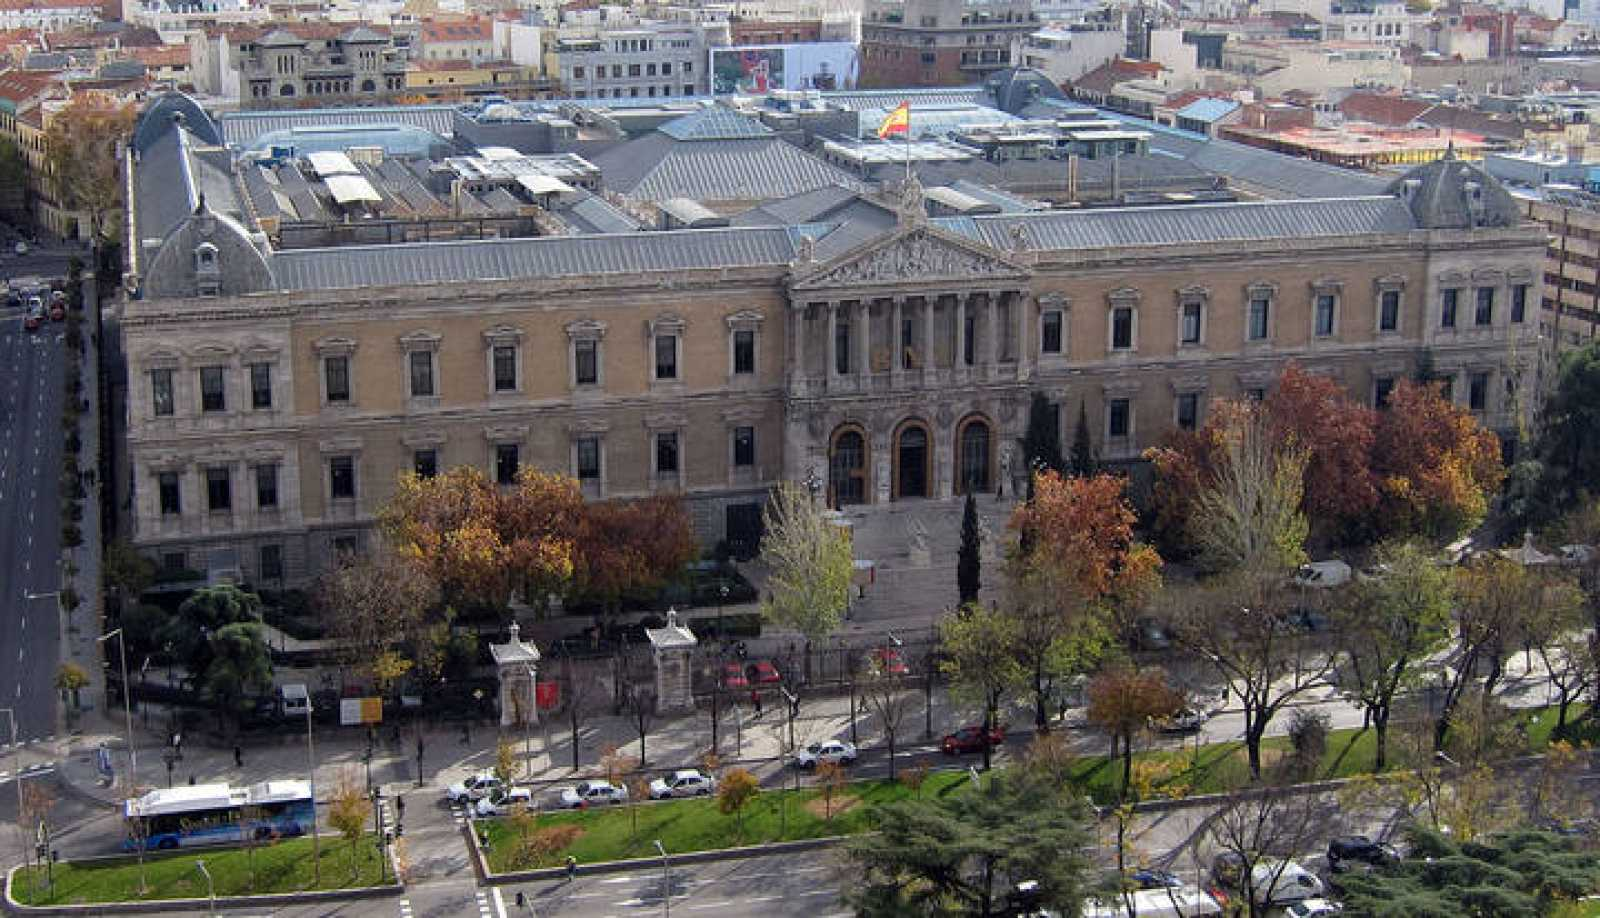 Edificio de la Biblioteca Nacional.